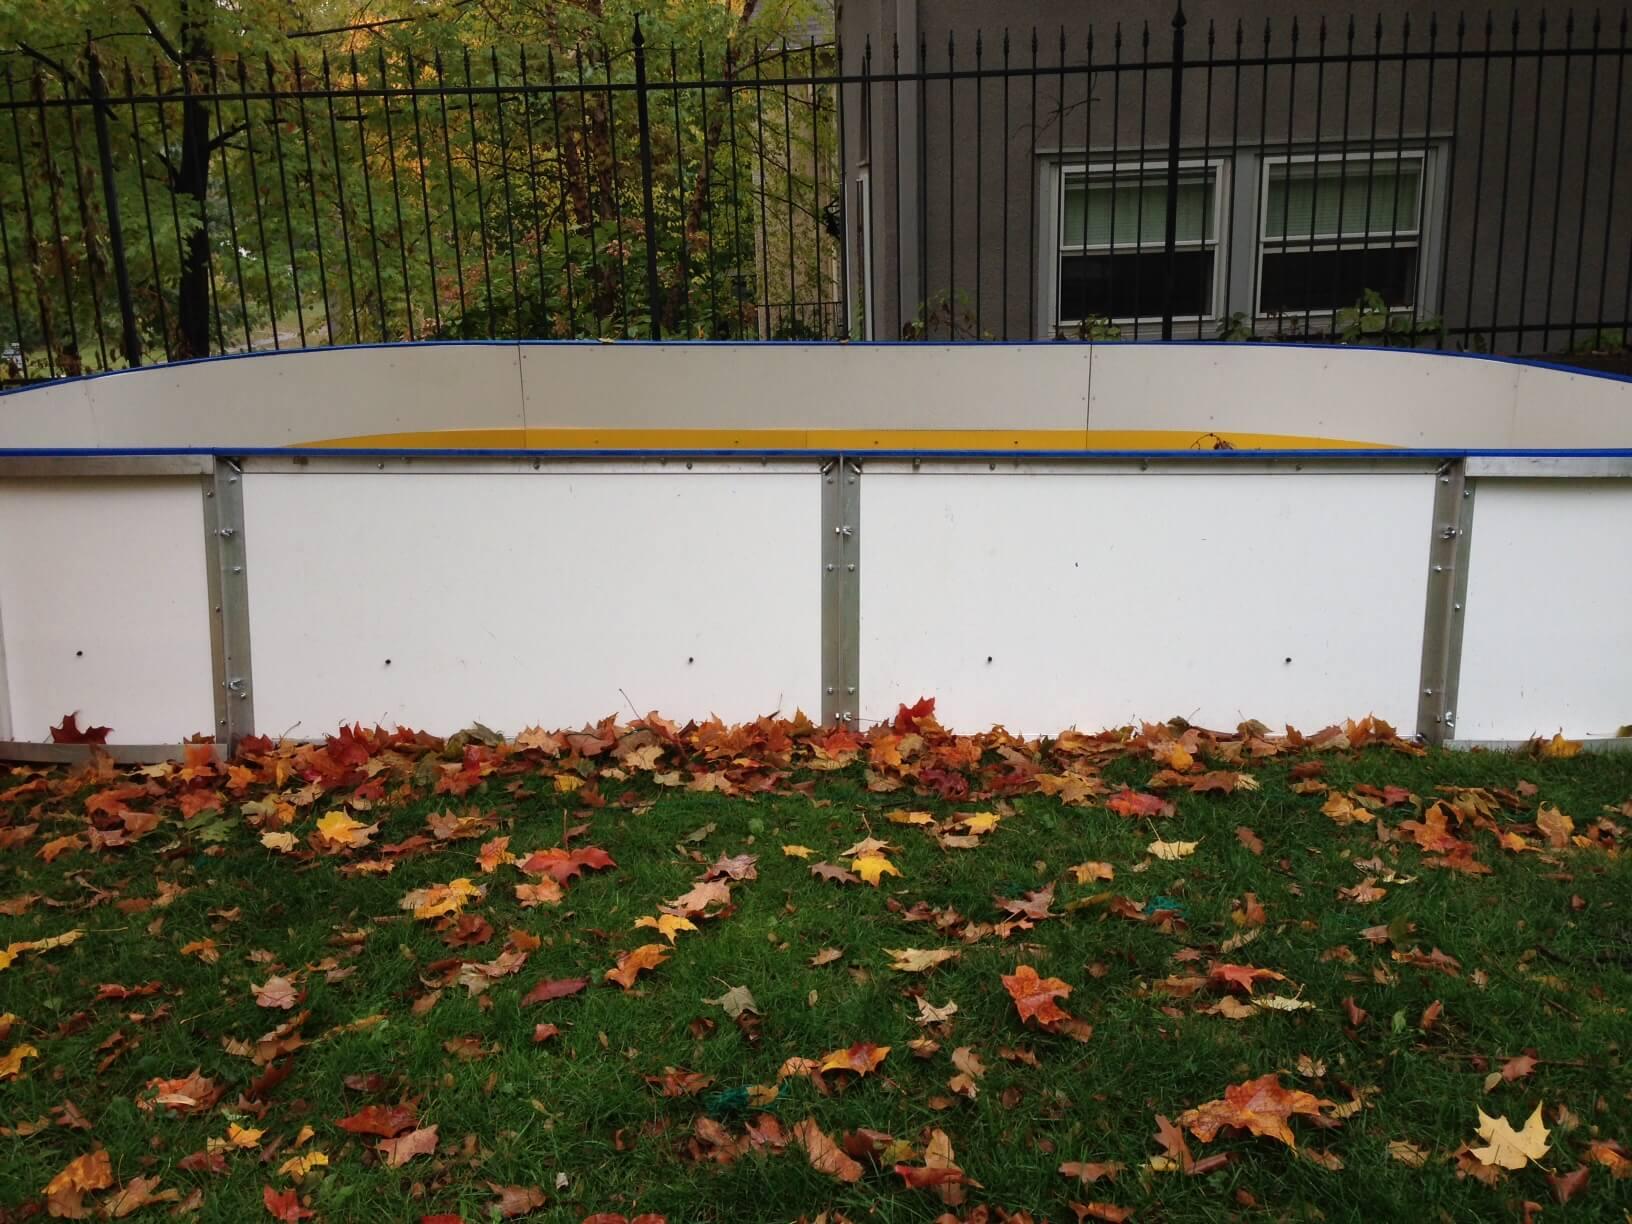 backyard rink tips